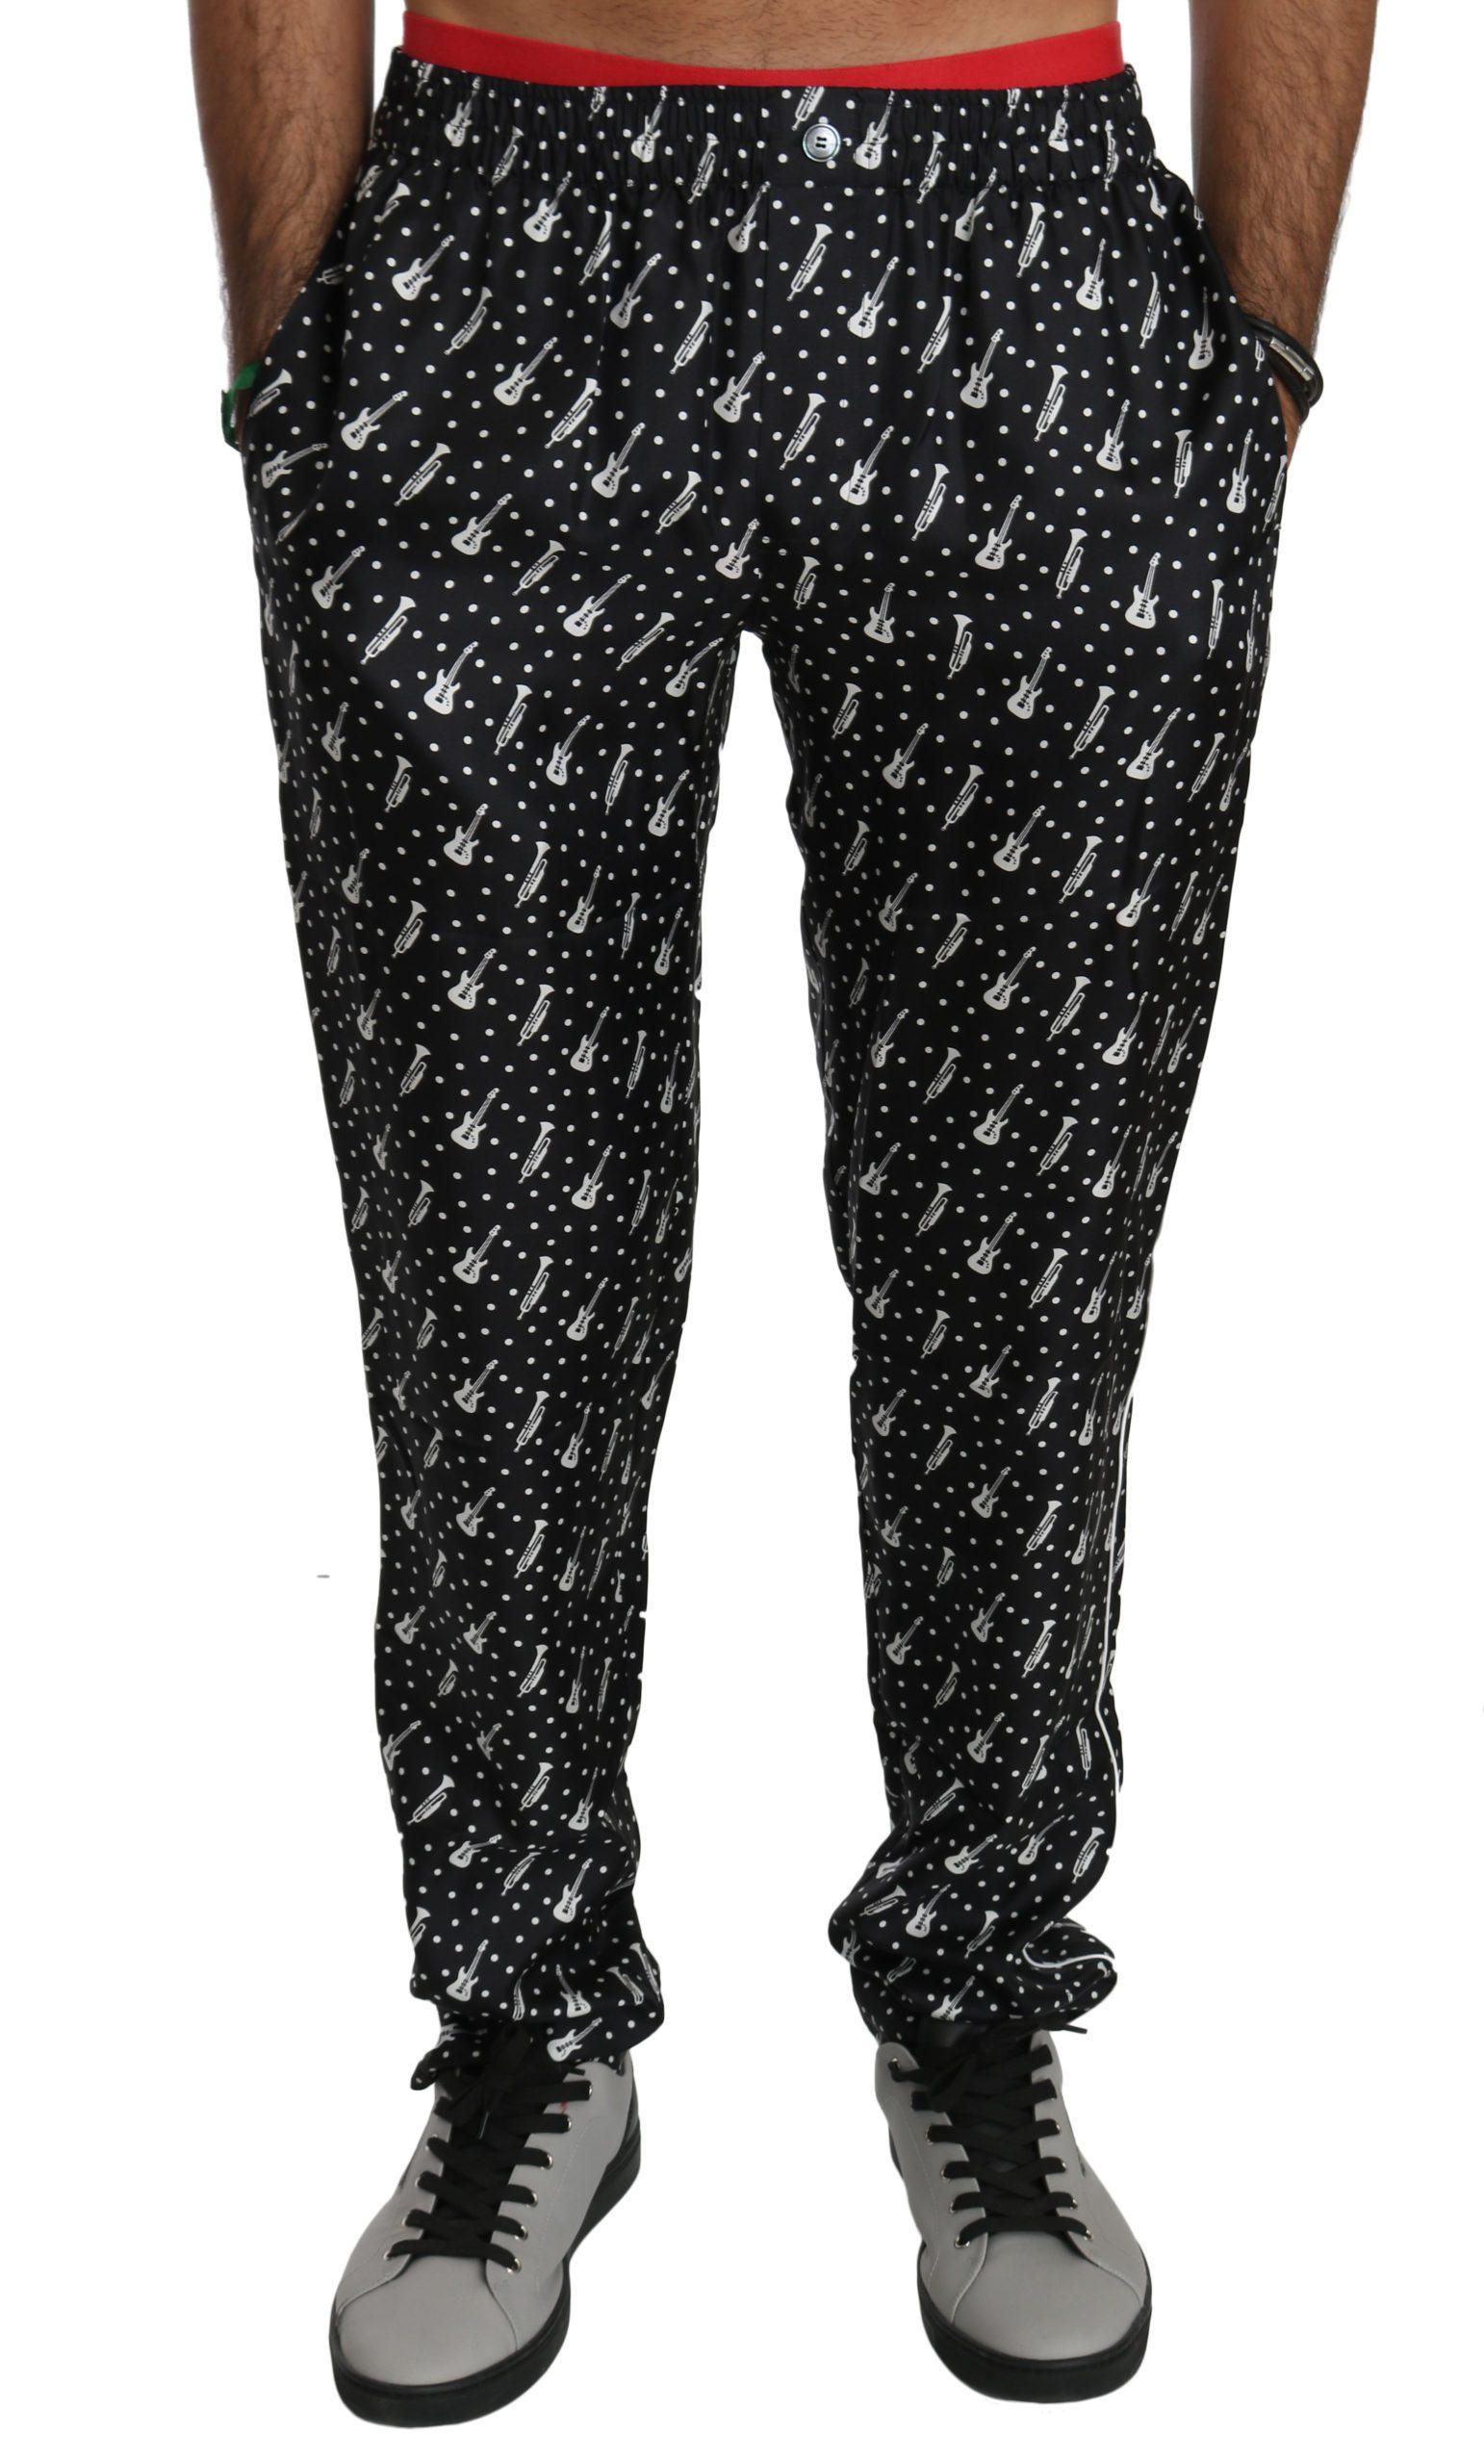 Dolce & Gabbana Men's Musical Instrument Trouser Black PAN70750 - IT54 | XL